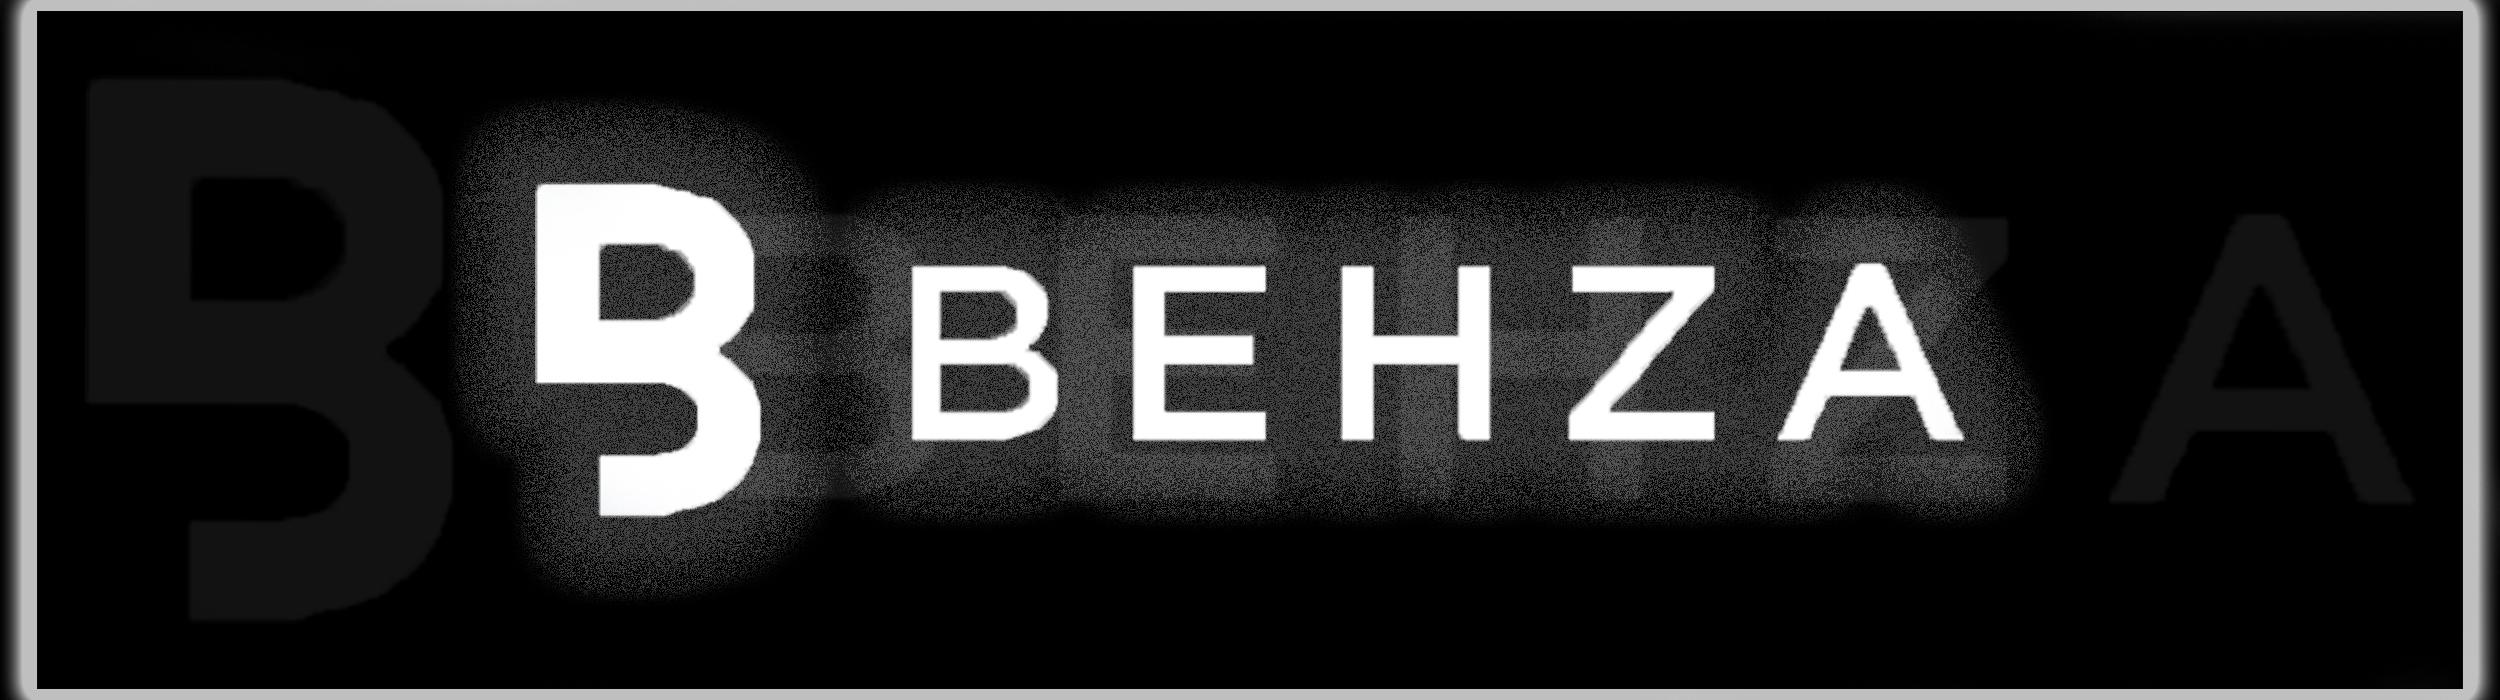 behza